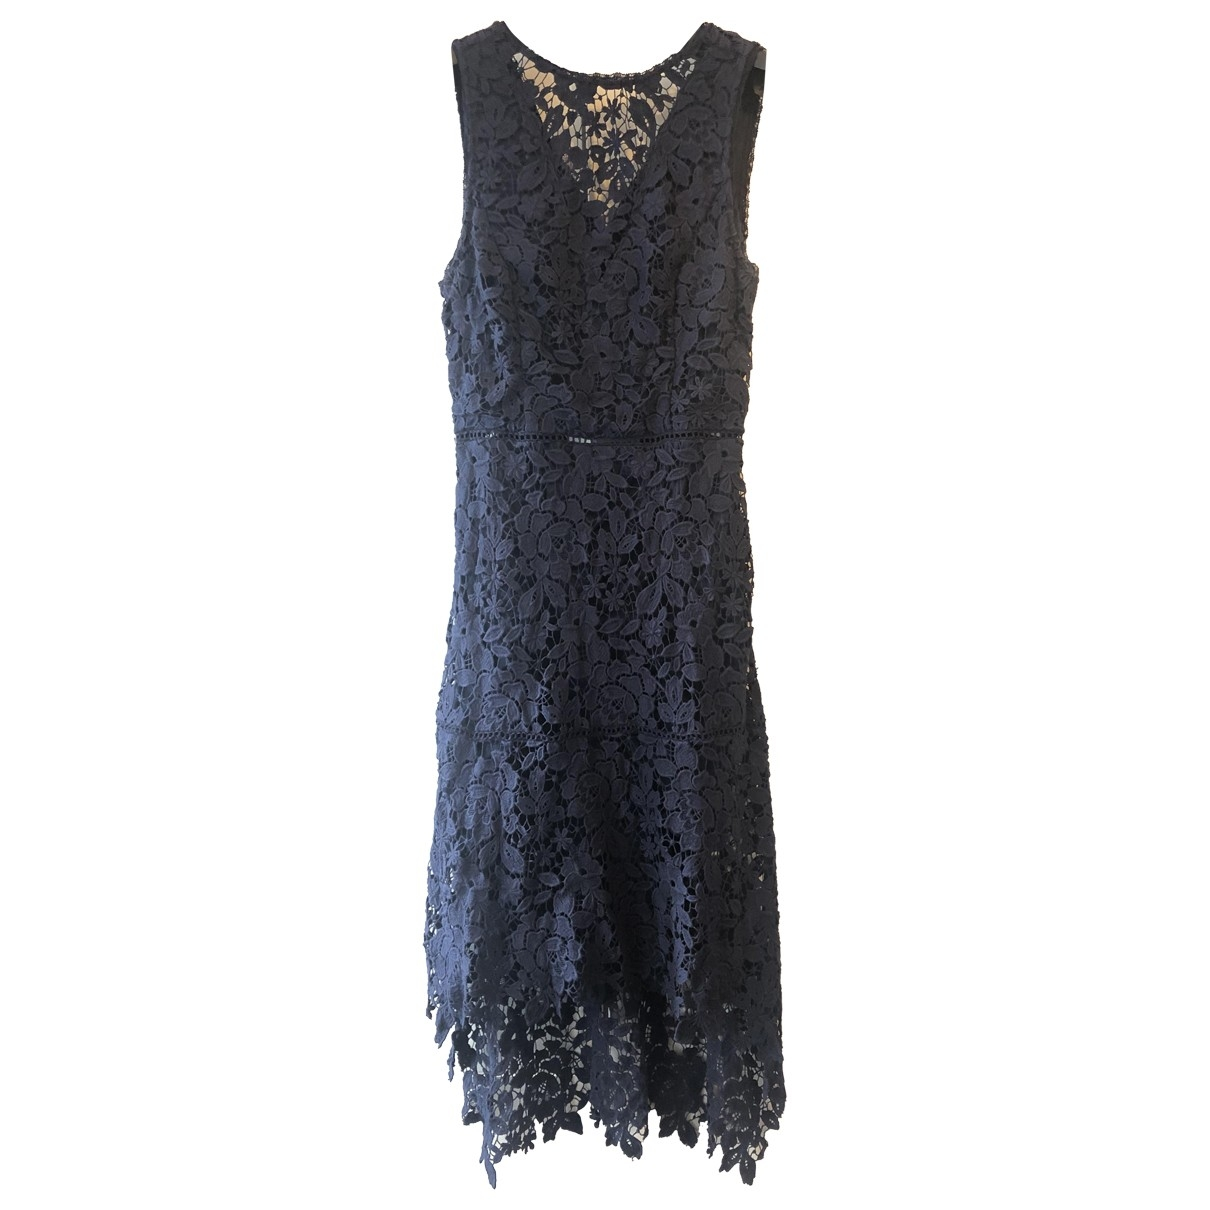 Joie \N Navy Lace dress for Women 36 FR